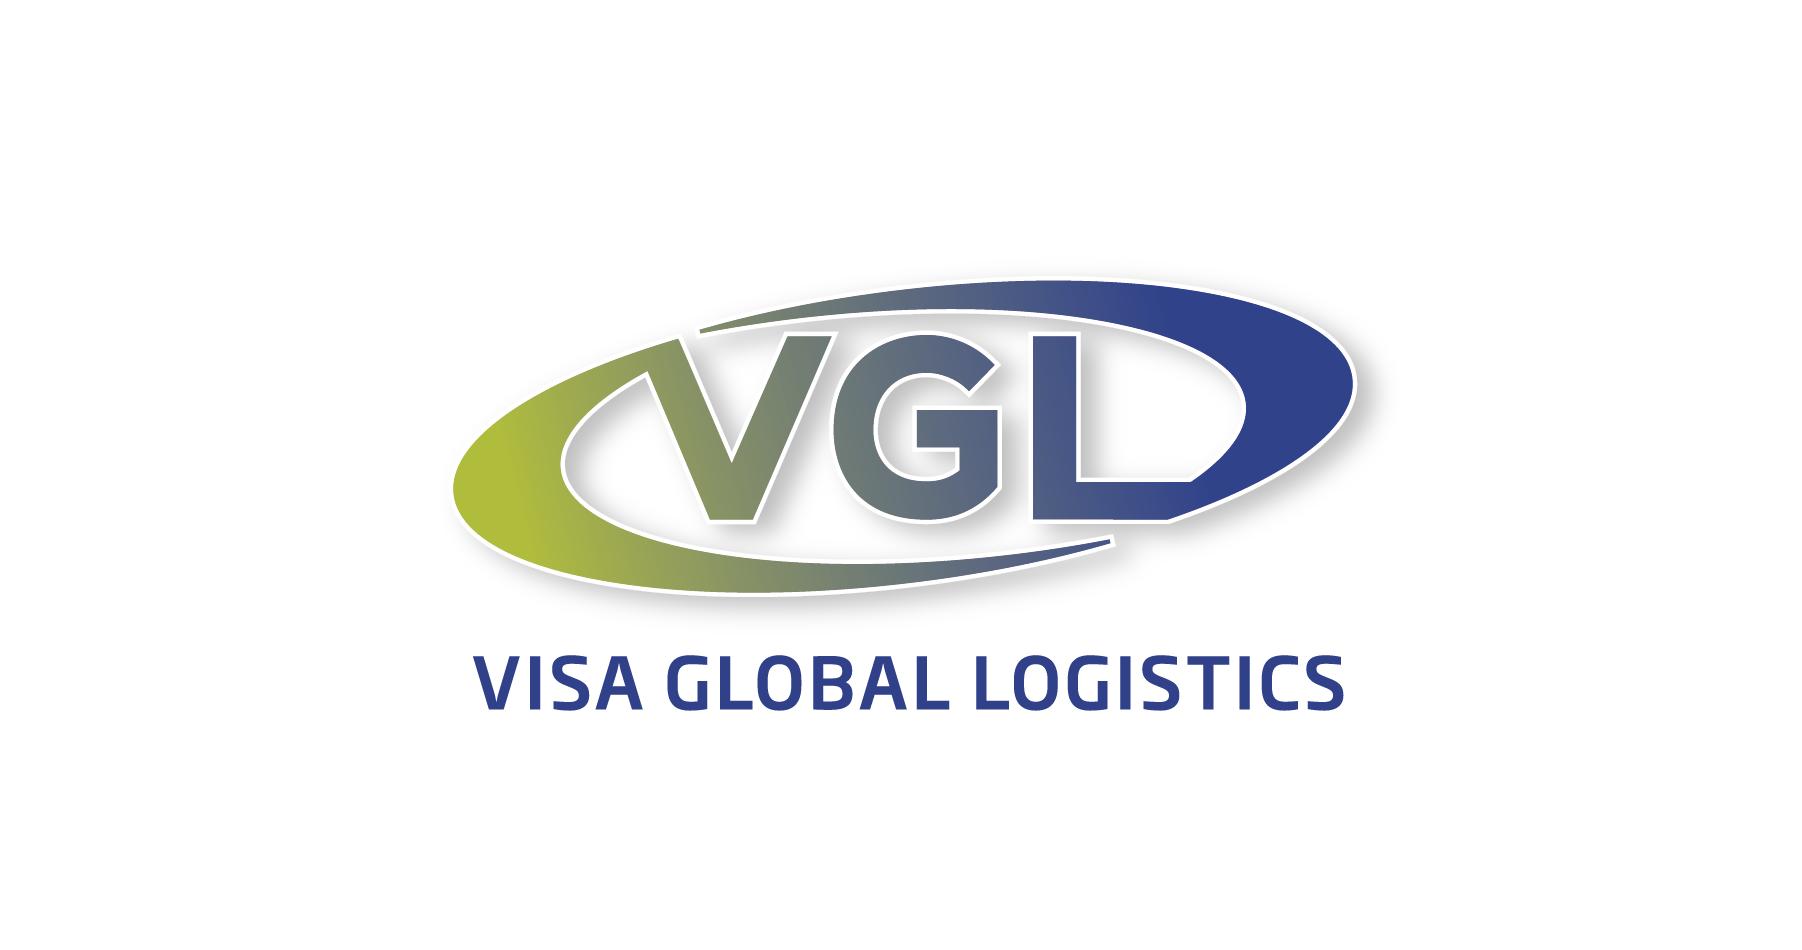 Fabrizio Di Tore - Branch Manager - VISA GLOBAL LOGISTICS SPA